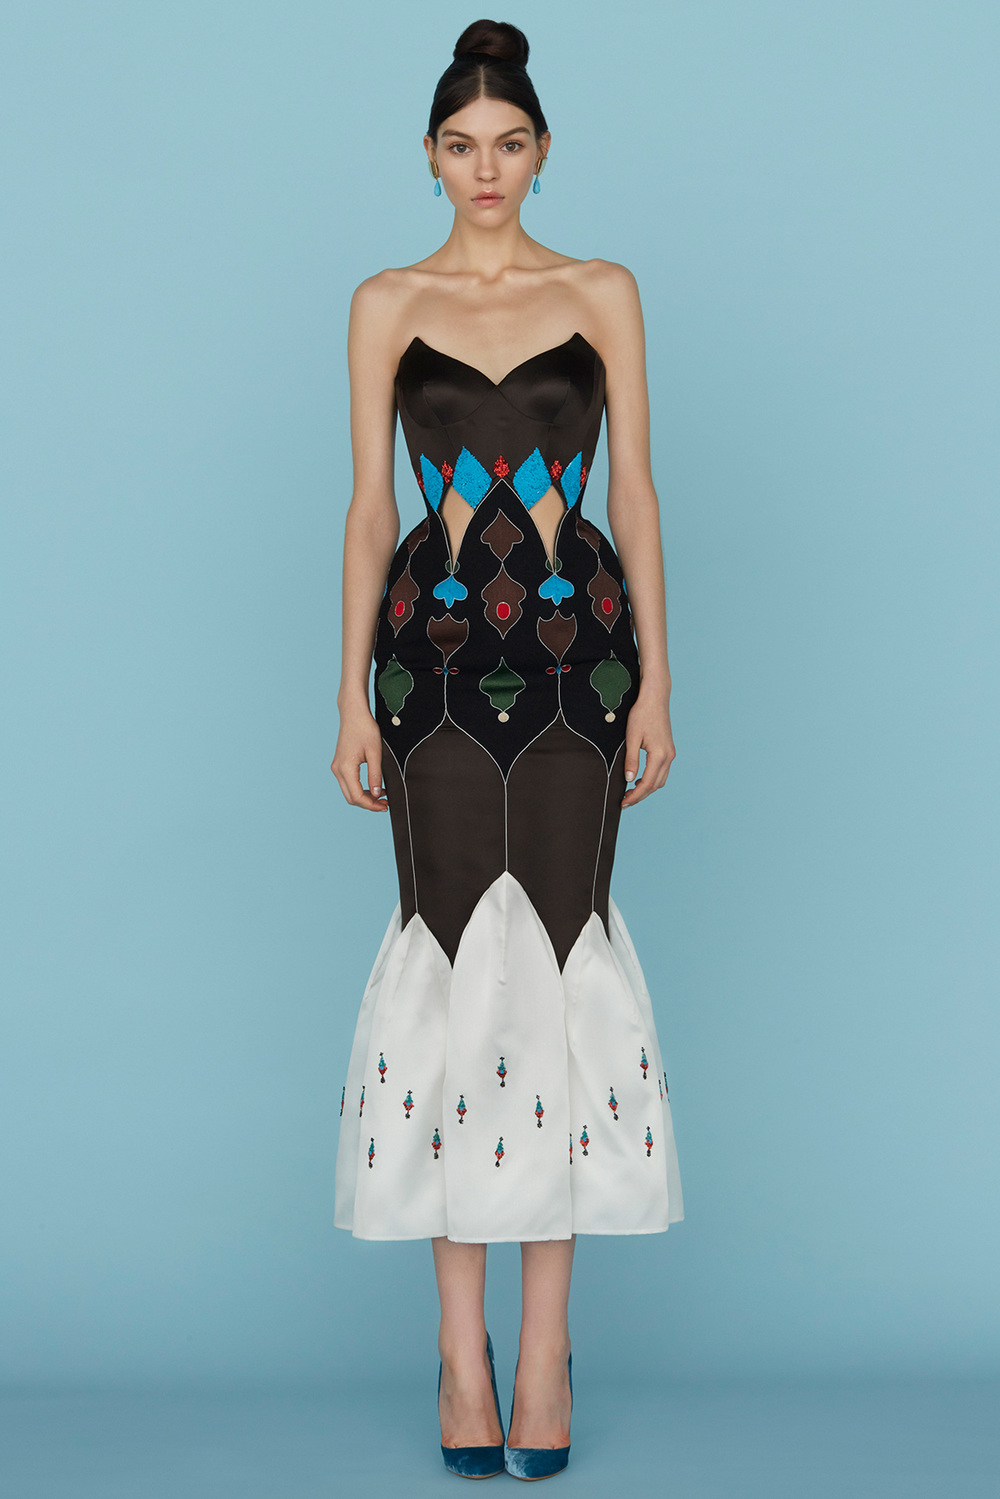 Spring 2015 Couture | Ulana Sergeenko